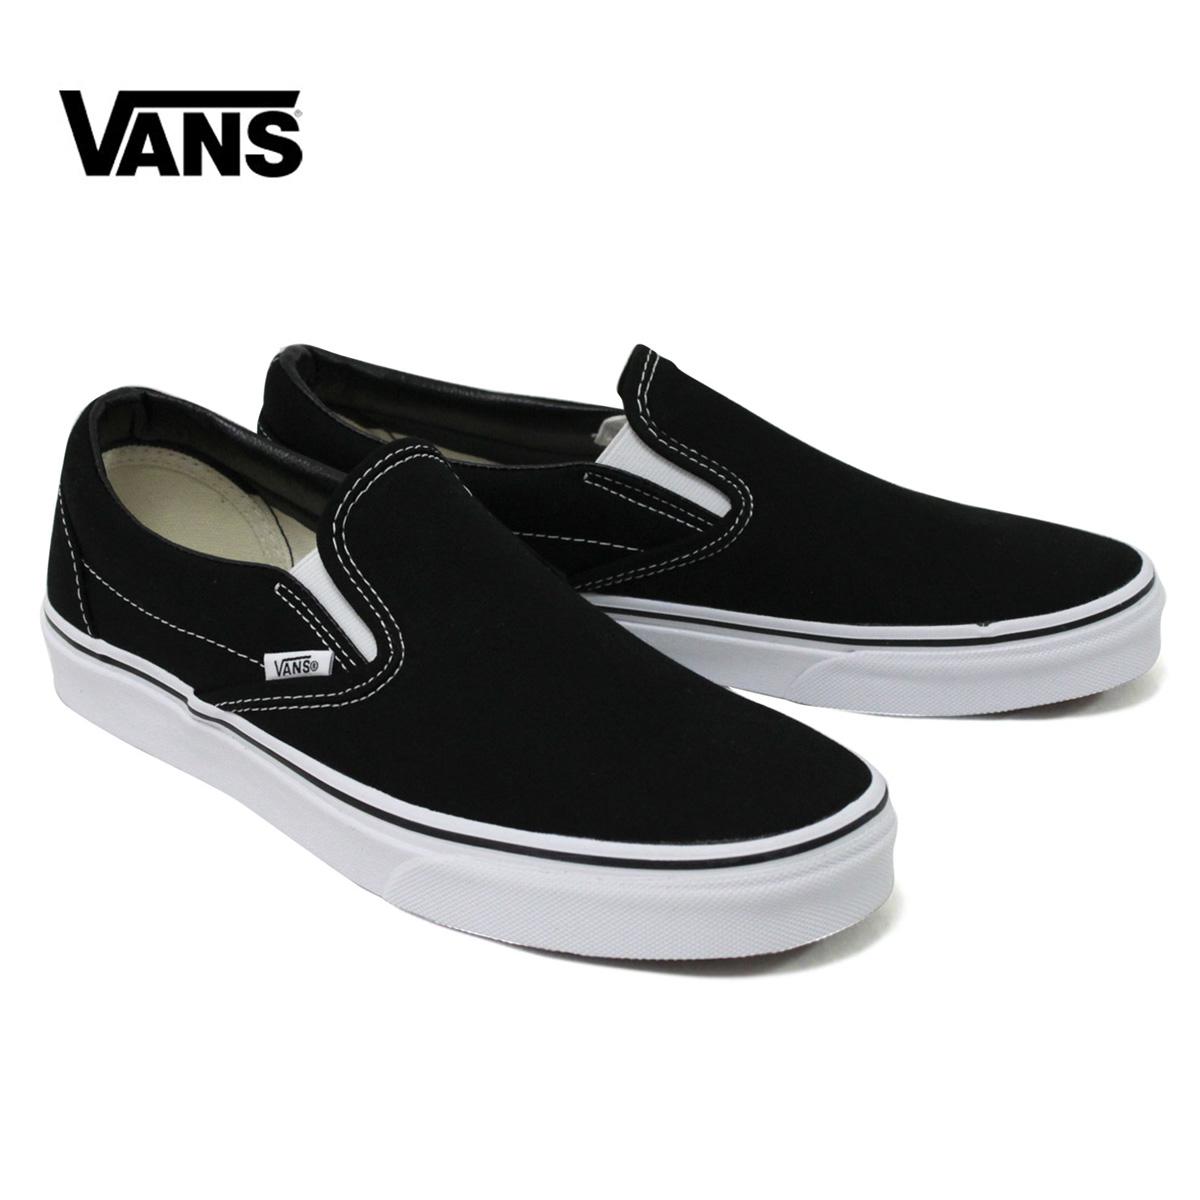 VANS バンズ Classic Slip On